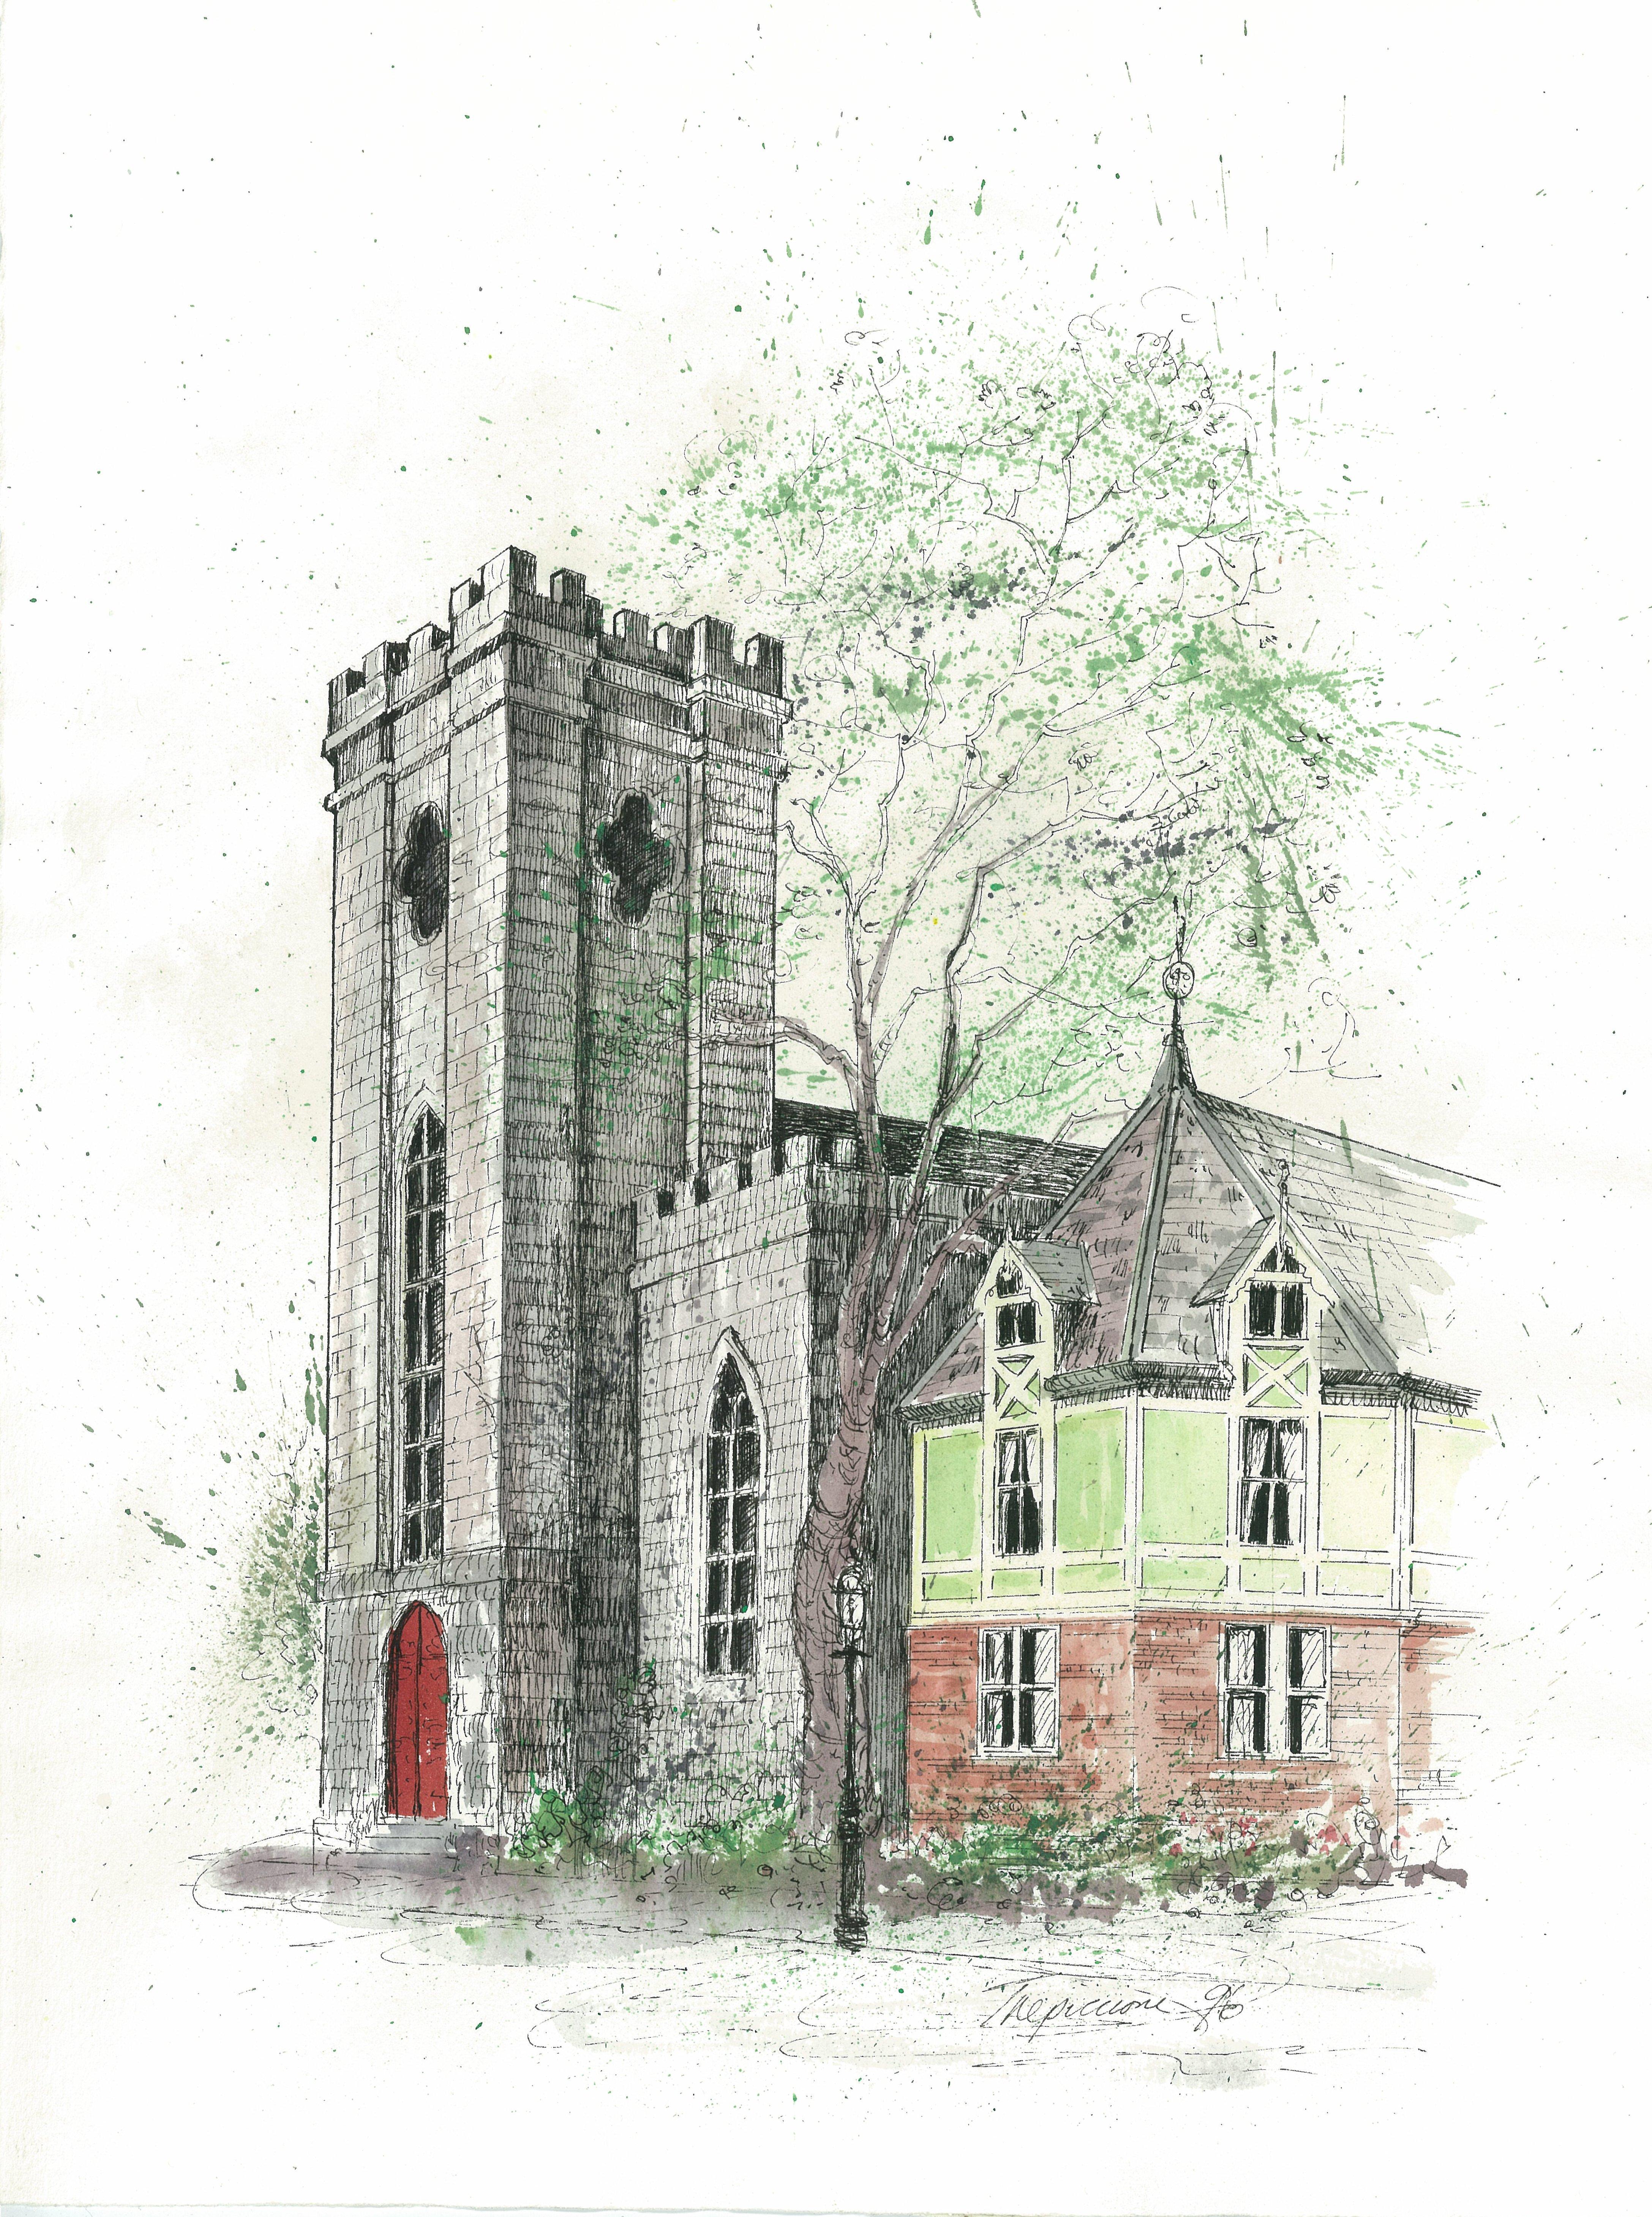 cartoon image of St. John's smaller file 001